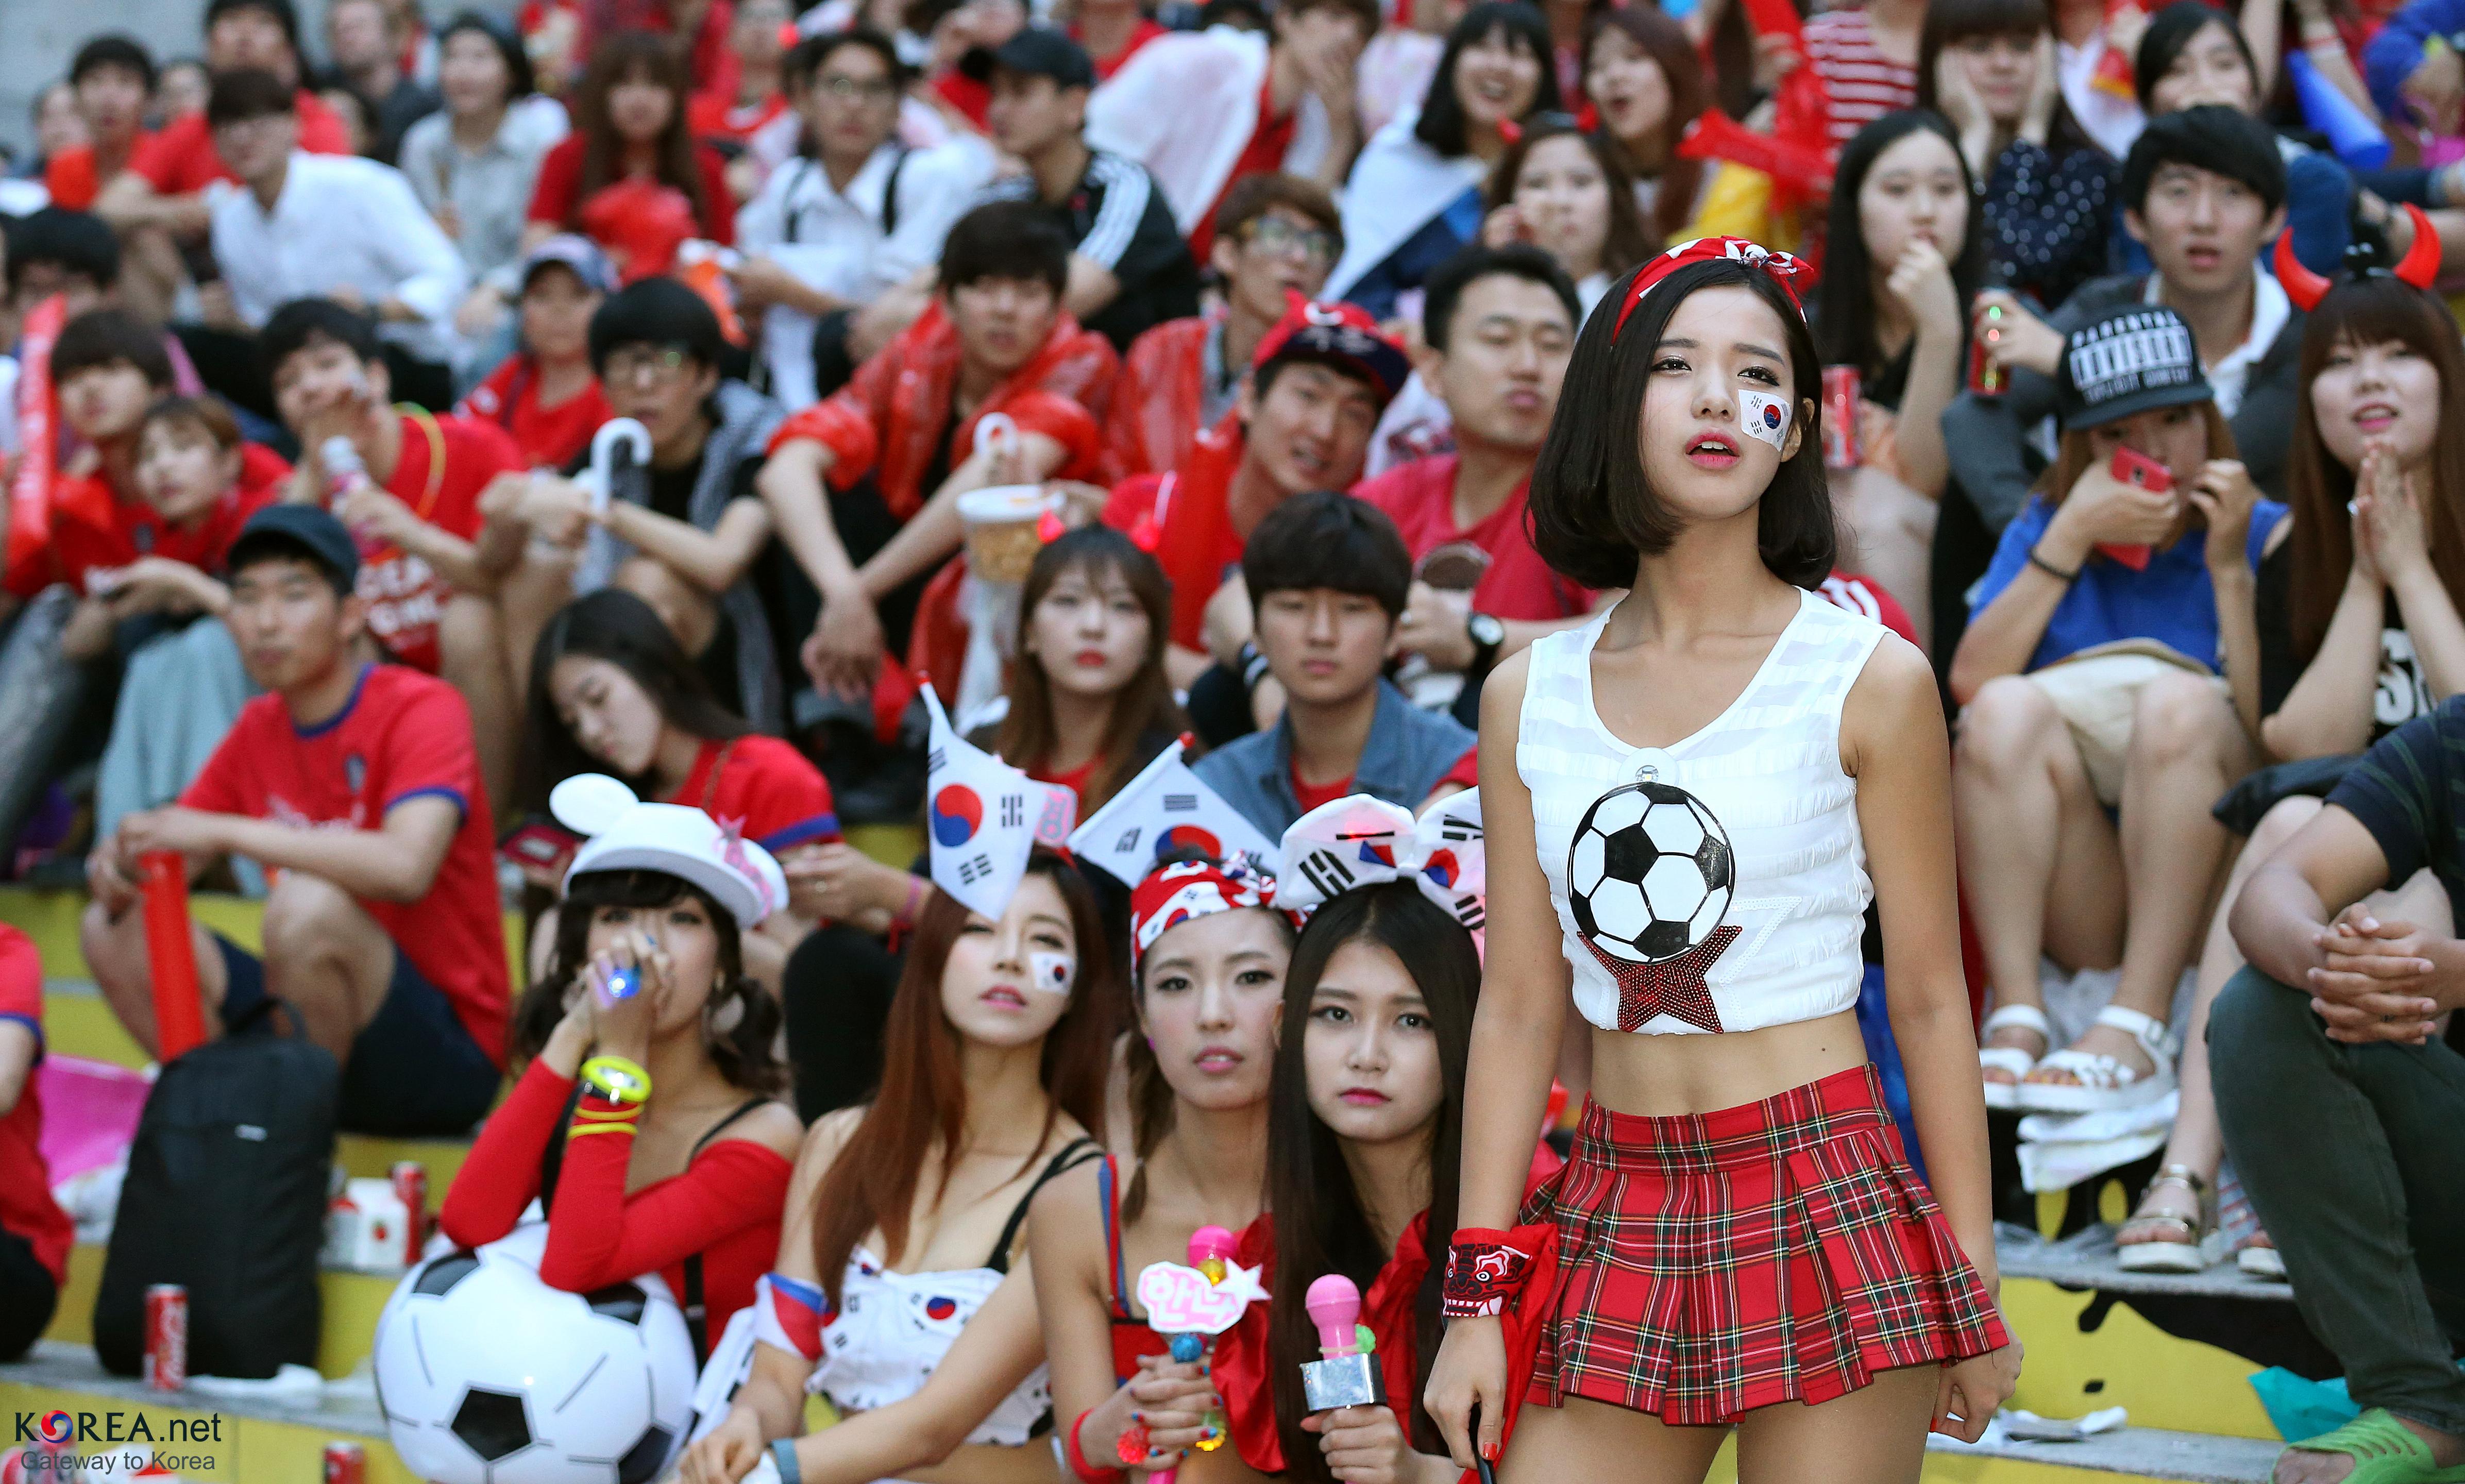 Americans dating south korean girls